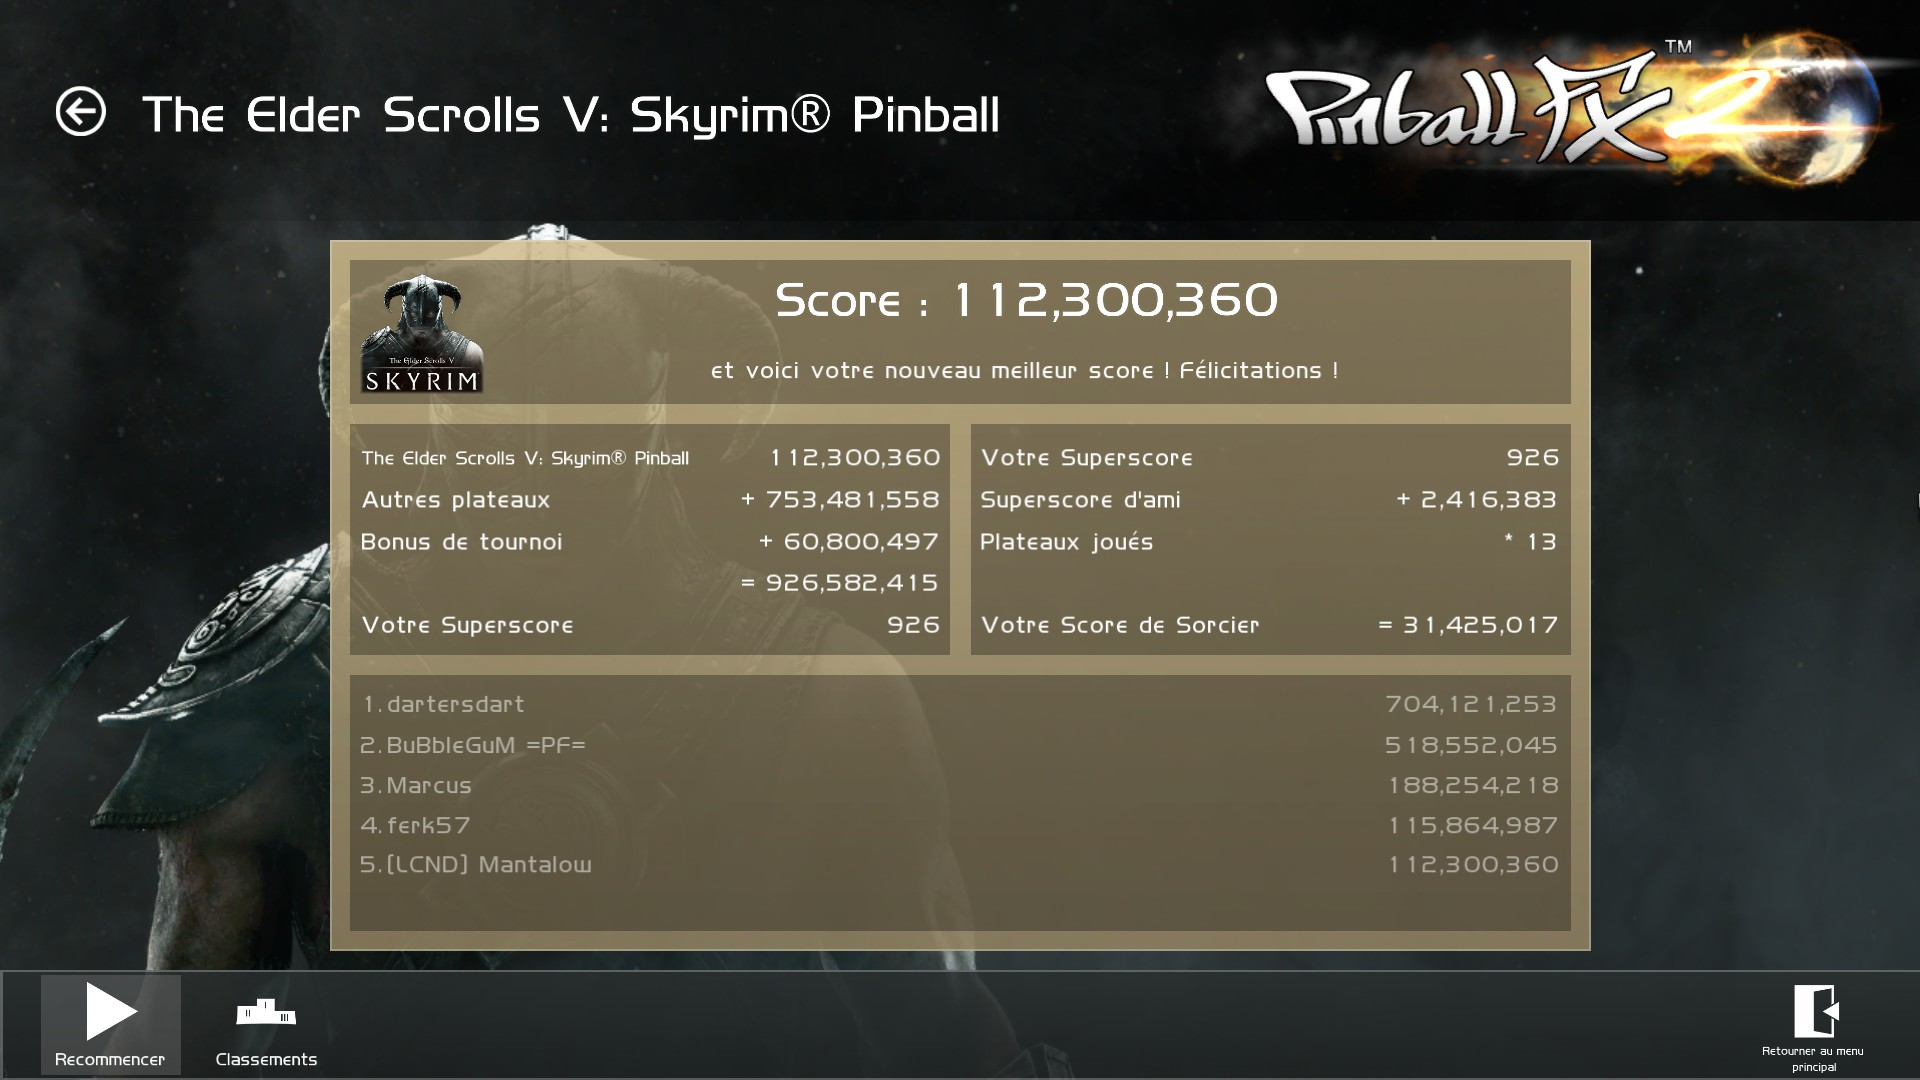 Mantalow: Pinball FX 2: The Elder Scrolls V: Skyrim Pinball (PC) 112,300,360 points on 2017-07-13 05:58:46